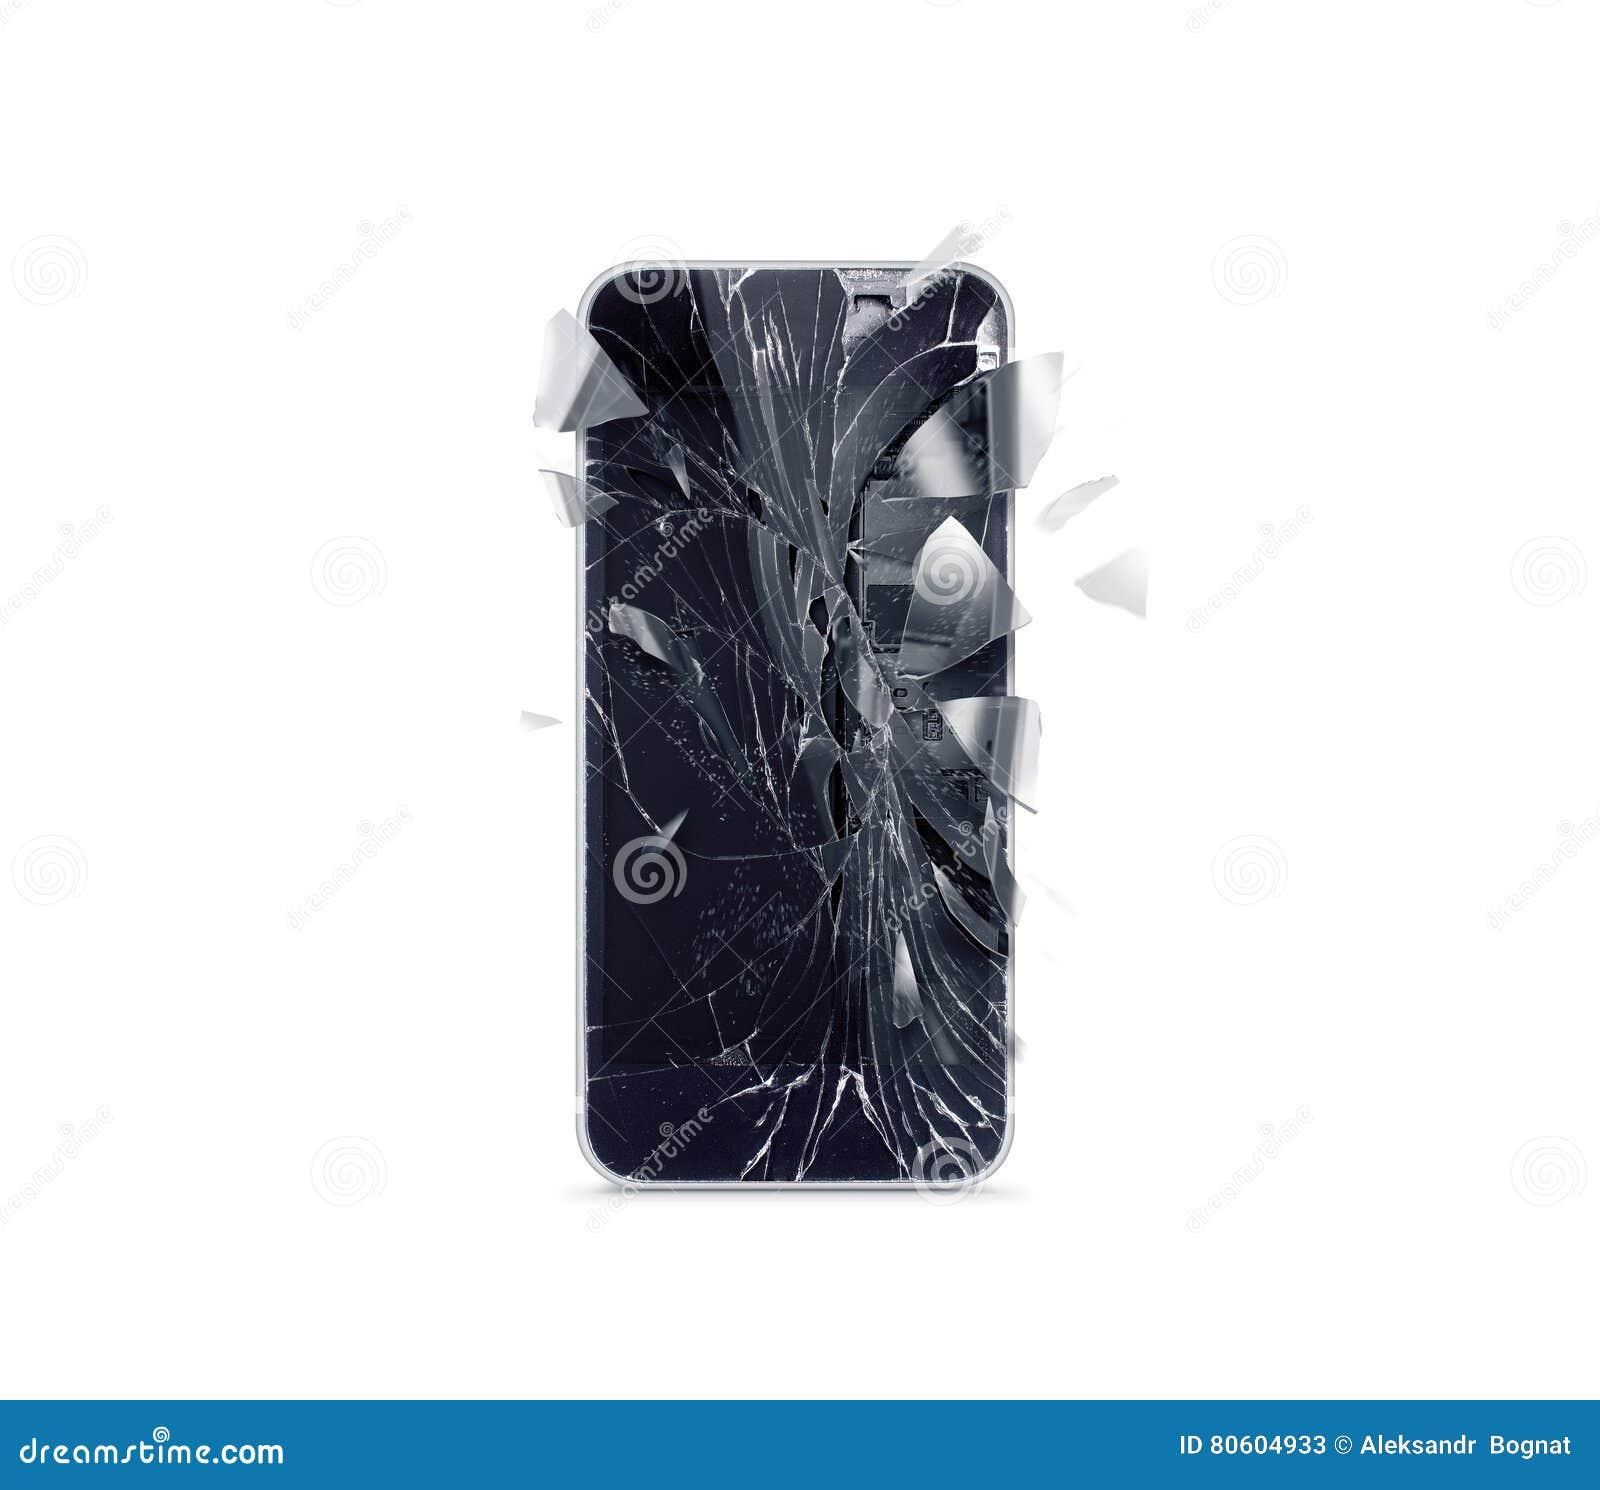 Pantalla quebrada del teléfono móvil, cascos dispersados